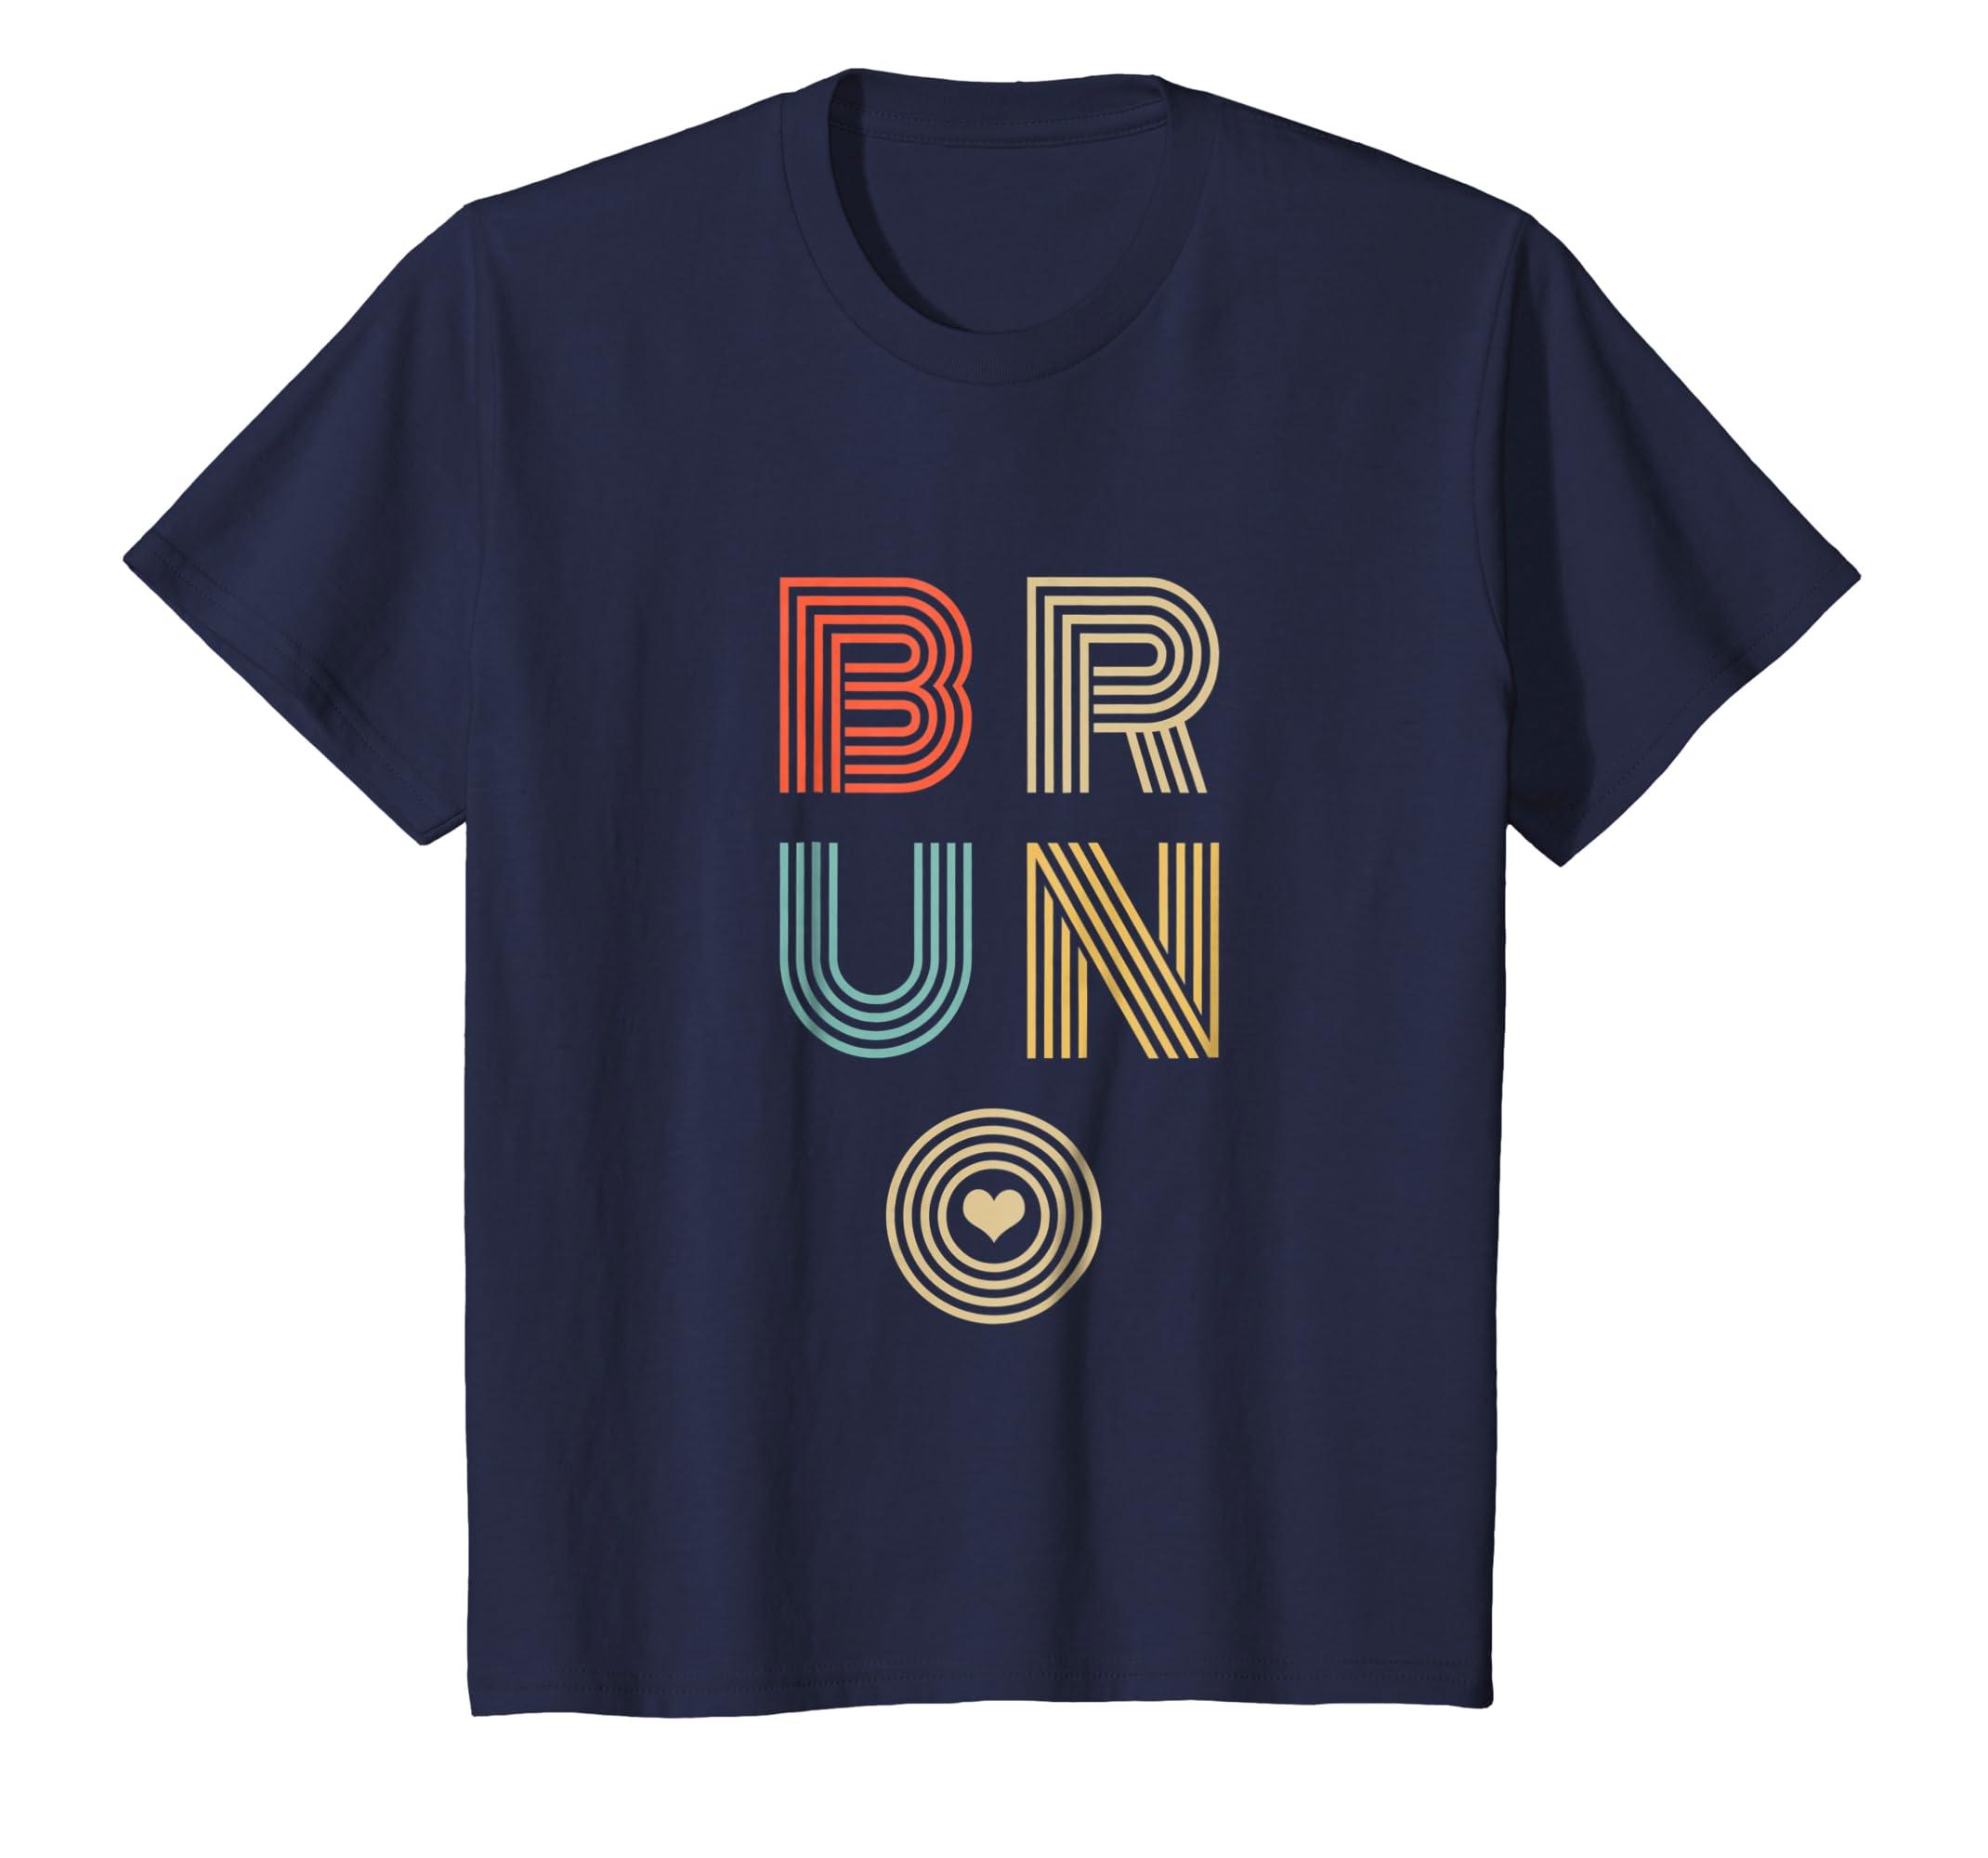 Bruno Lover Heart T Shirt Vintage Retro Style-Teechatpro